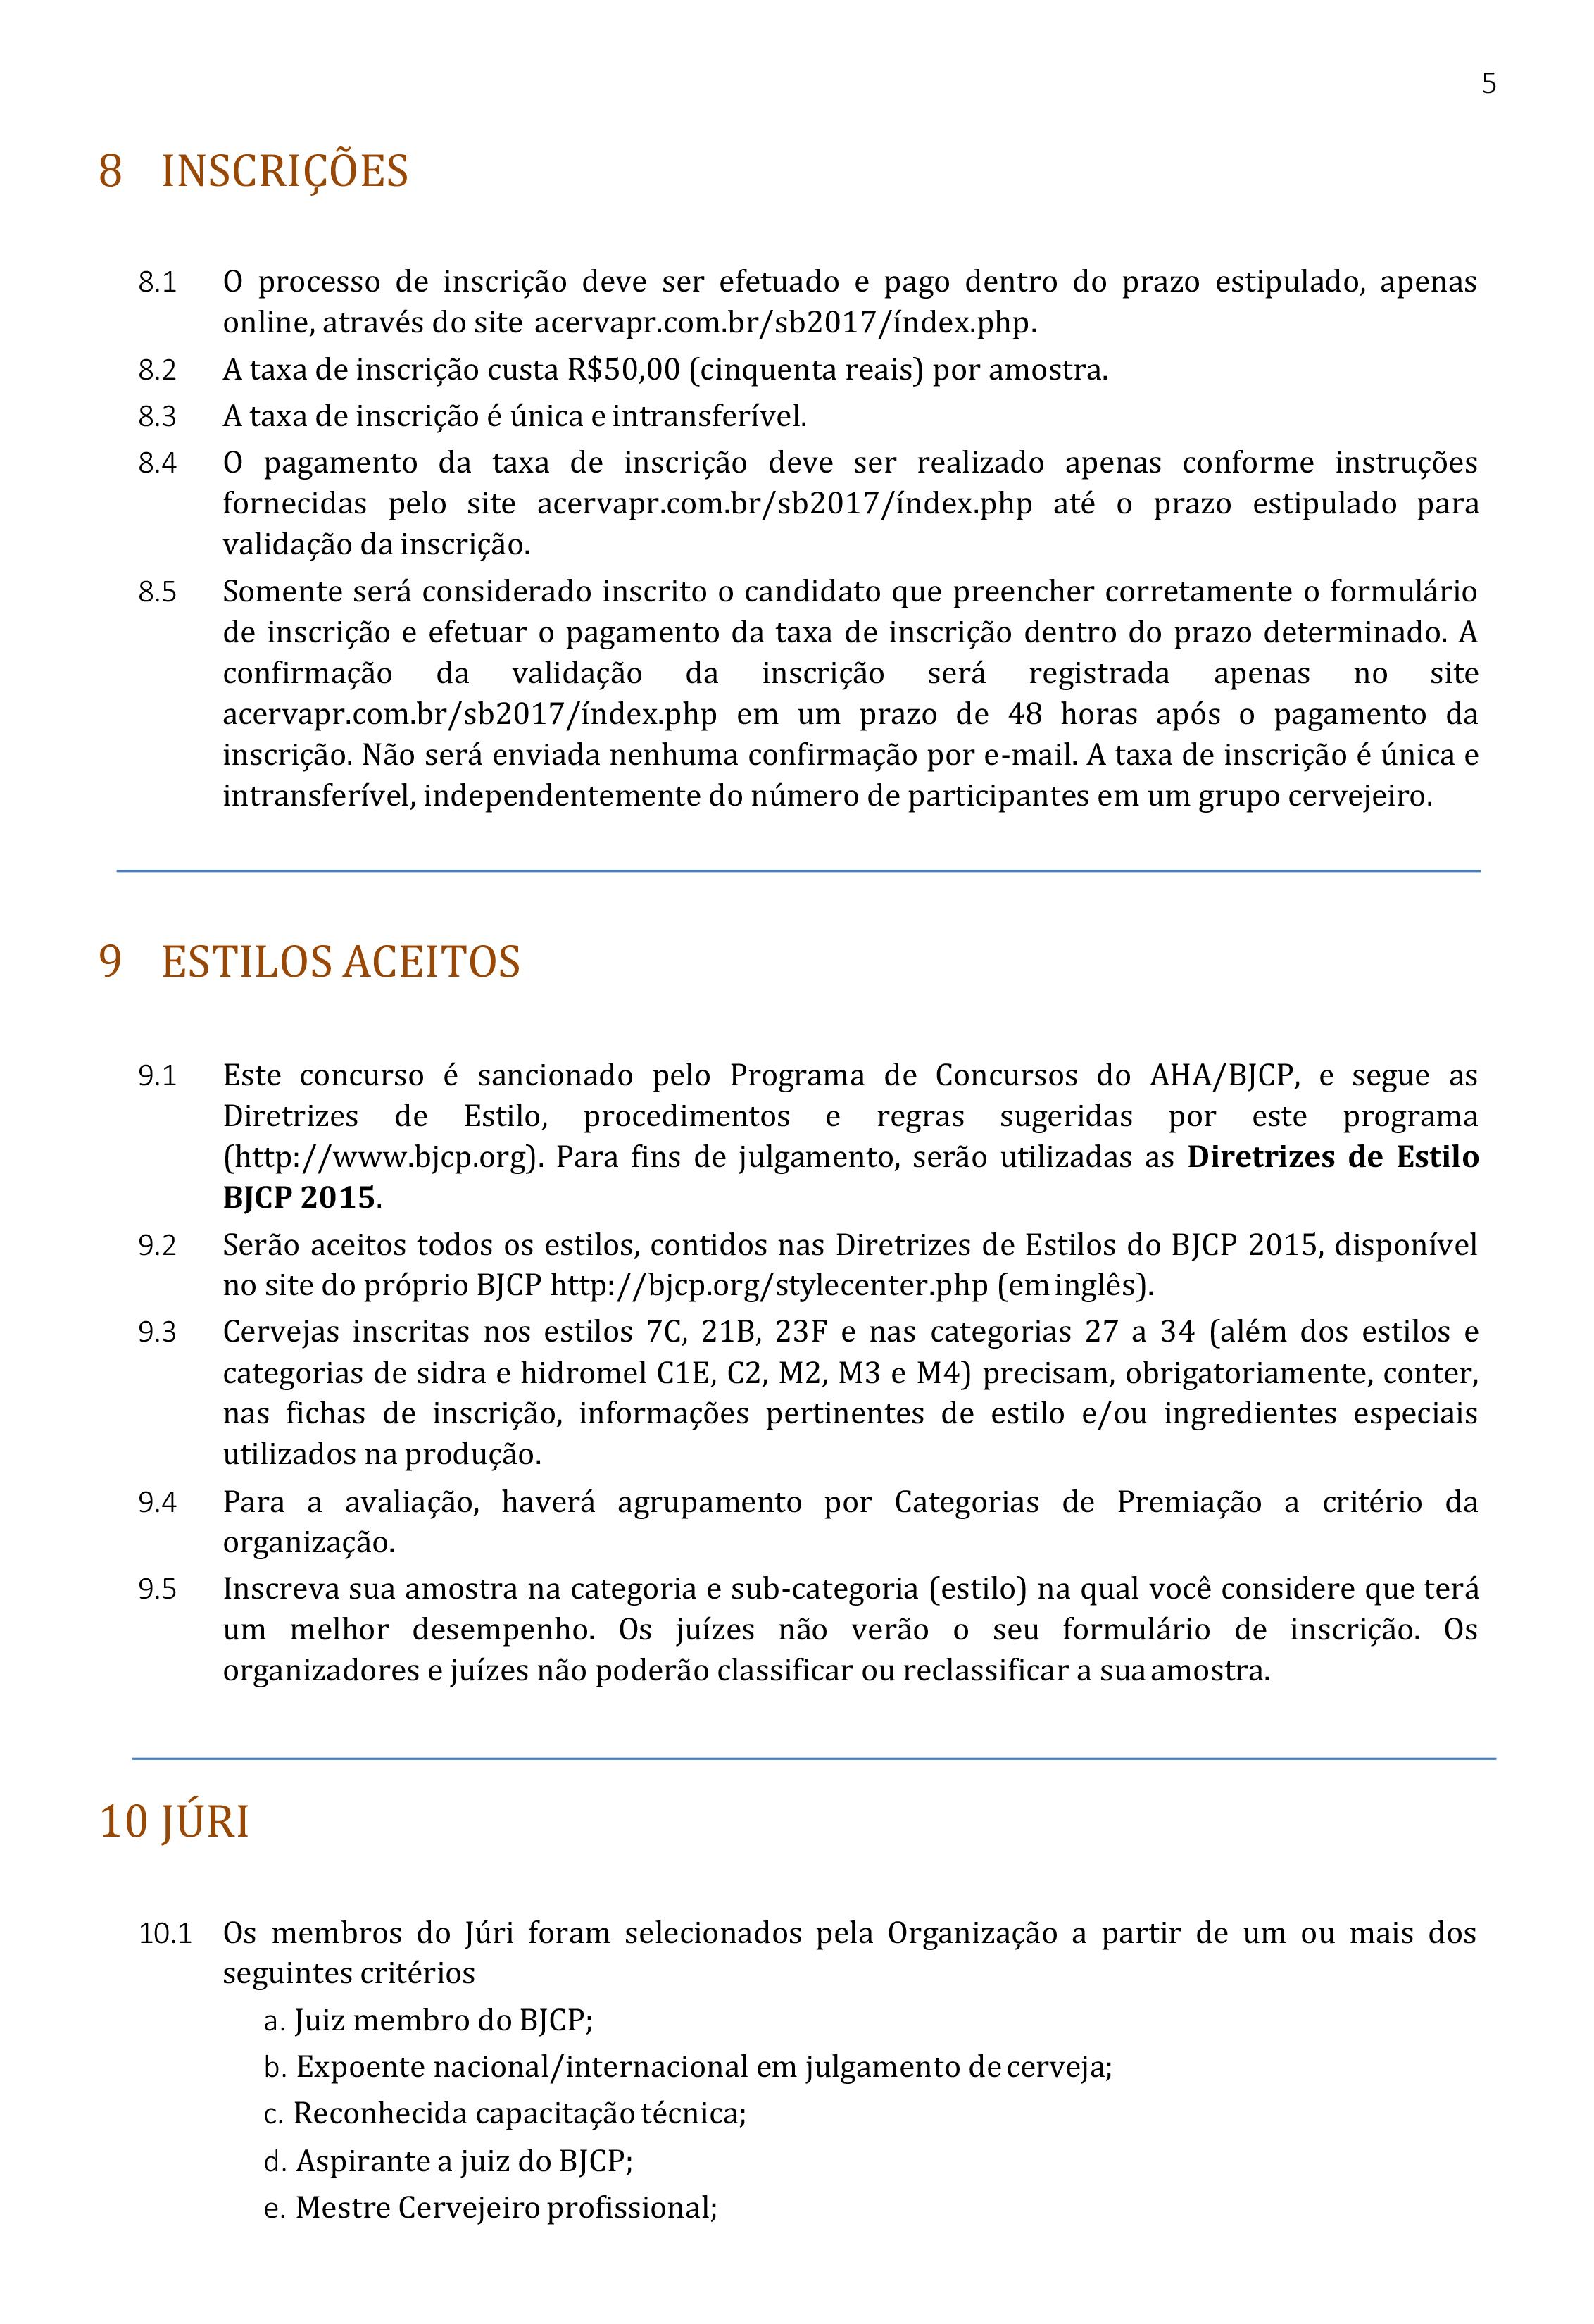 IV Concurso Sulbrasileiro 2017-Regulamento-5.jpg